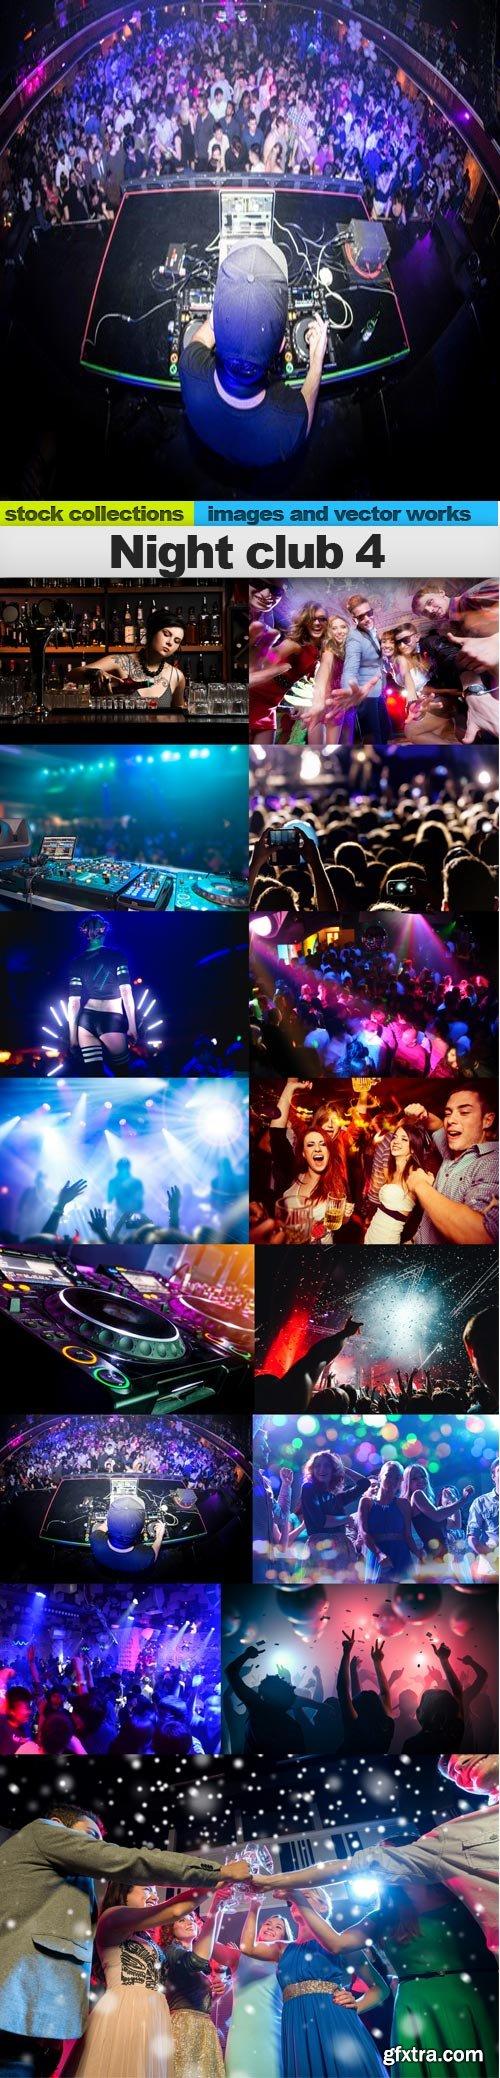 Night club 4, 15 x UHQ JPEG